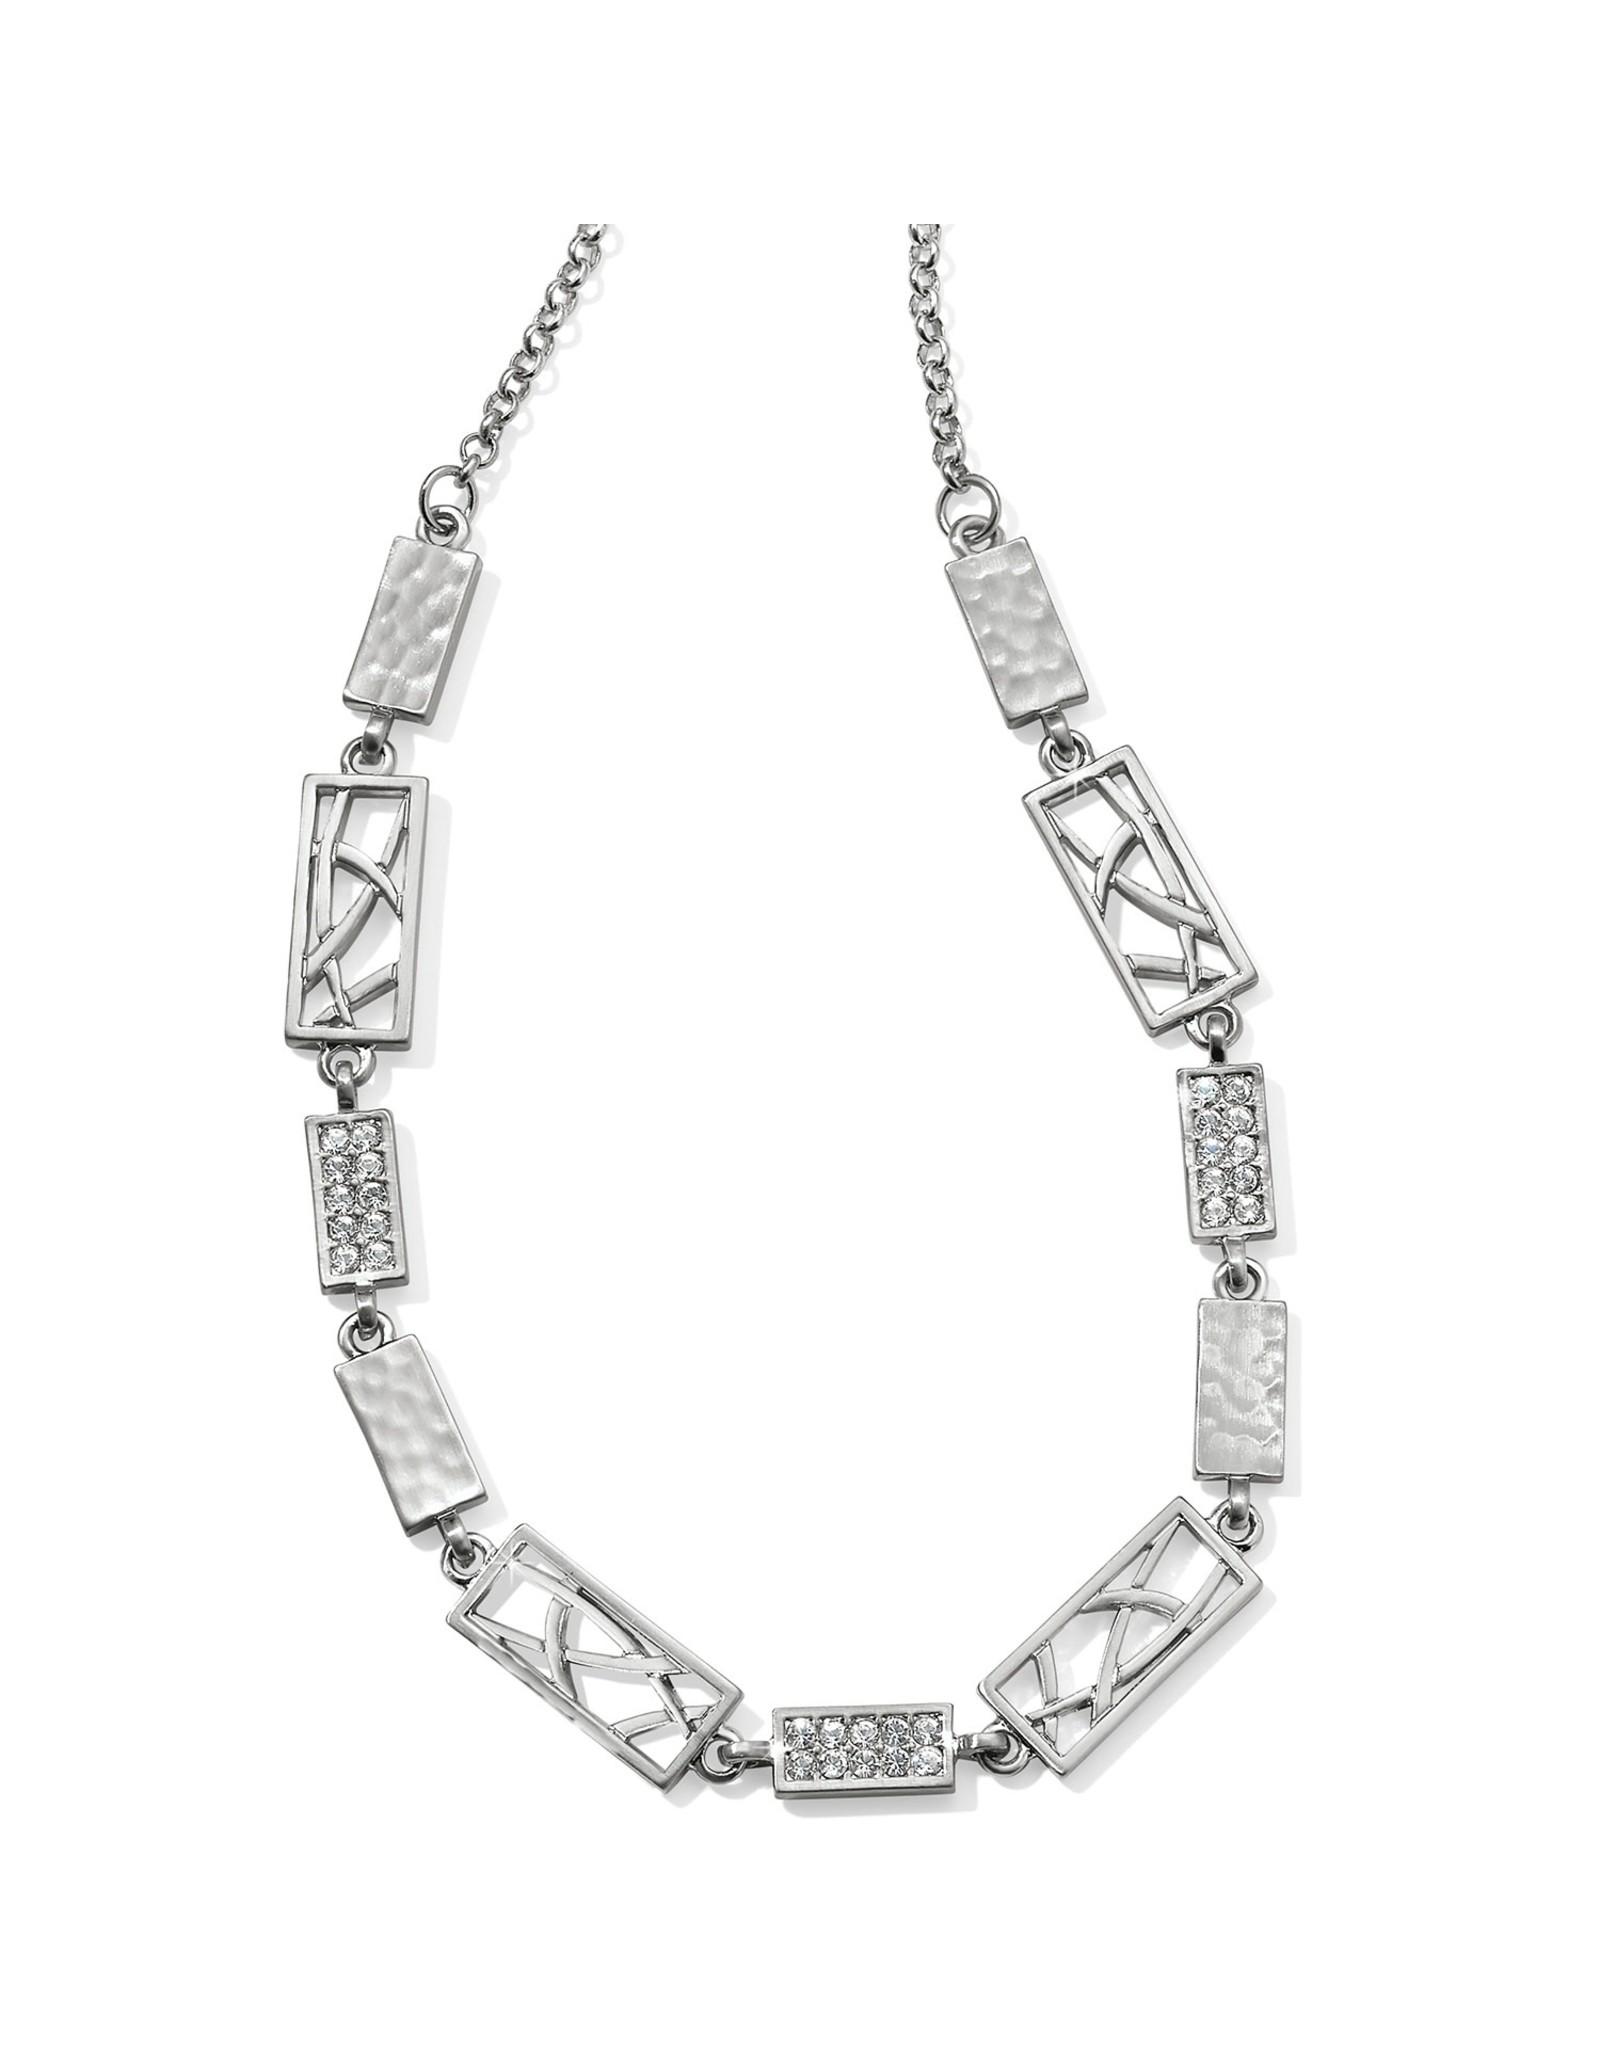 Brighton JL9461 Meridian Zenith Choker Necklace